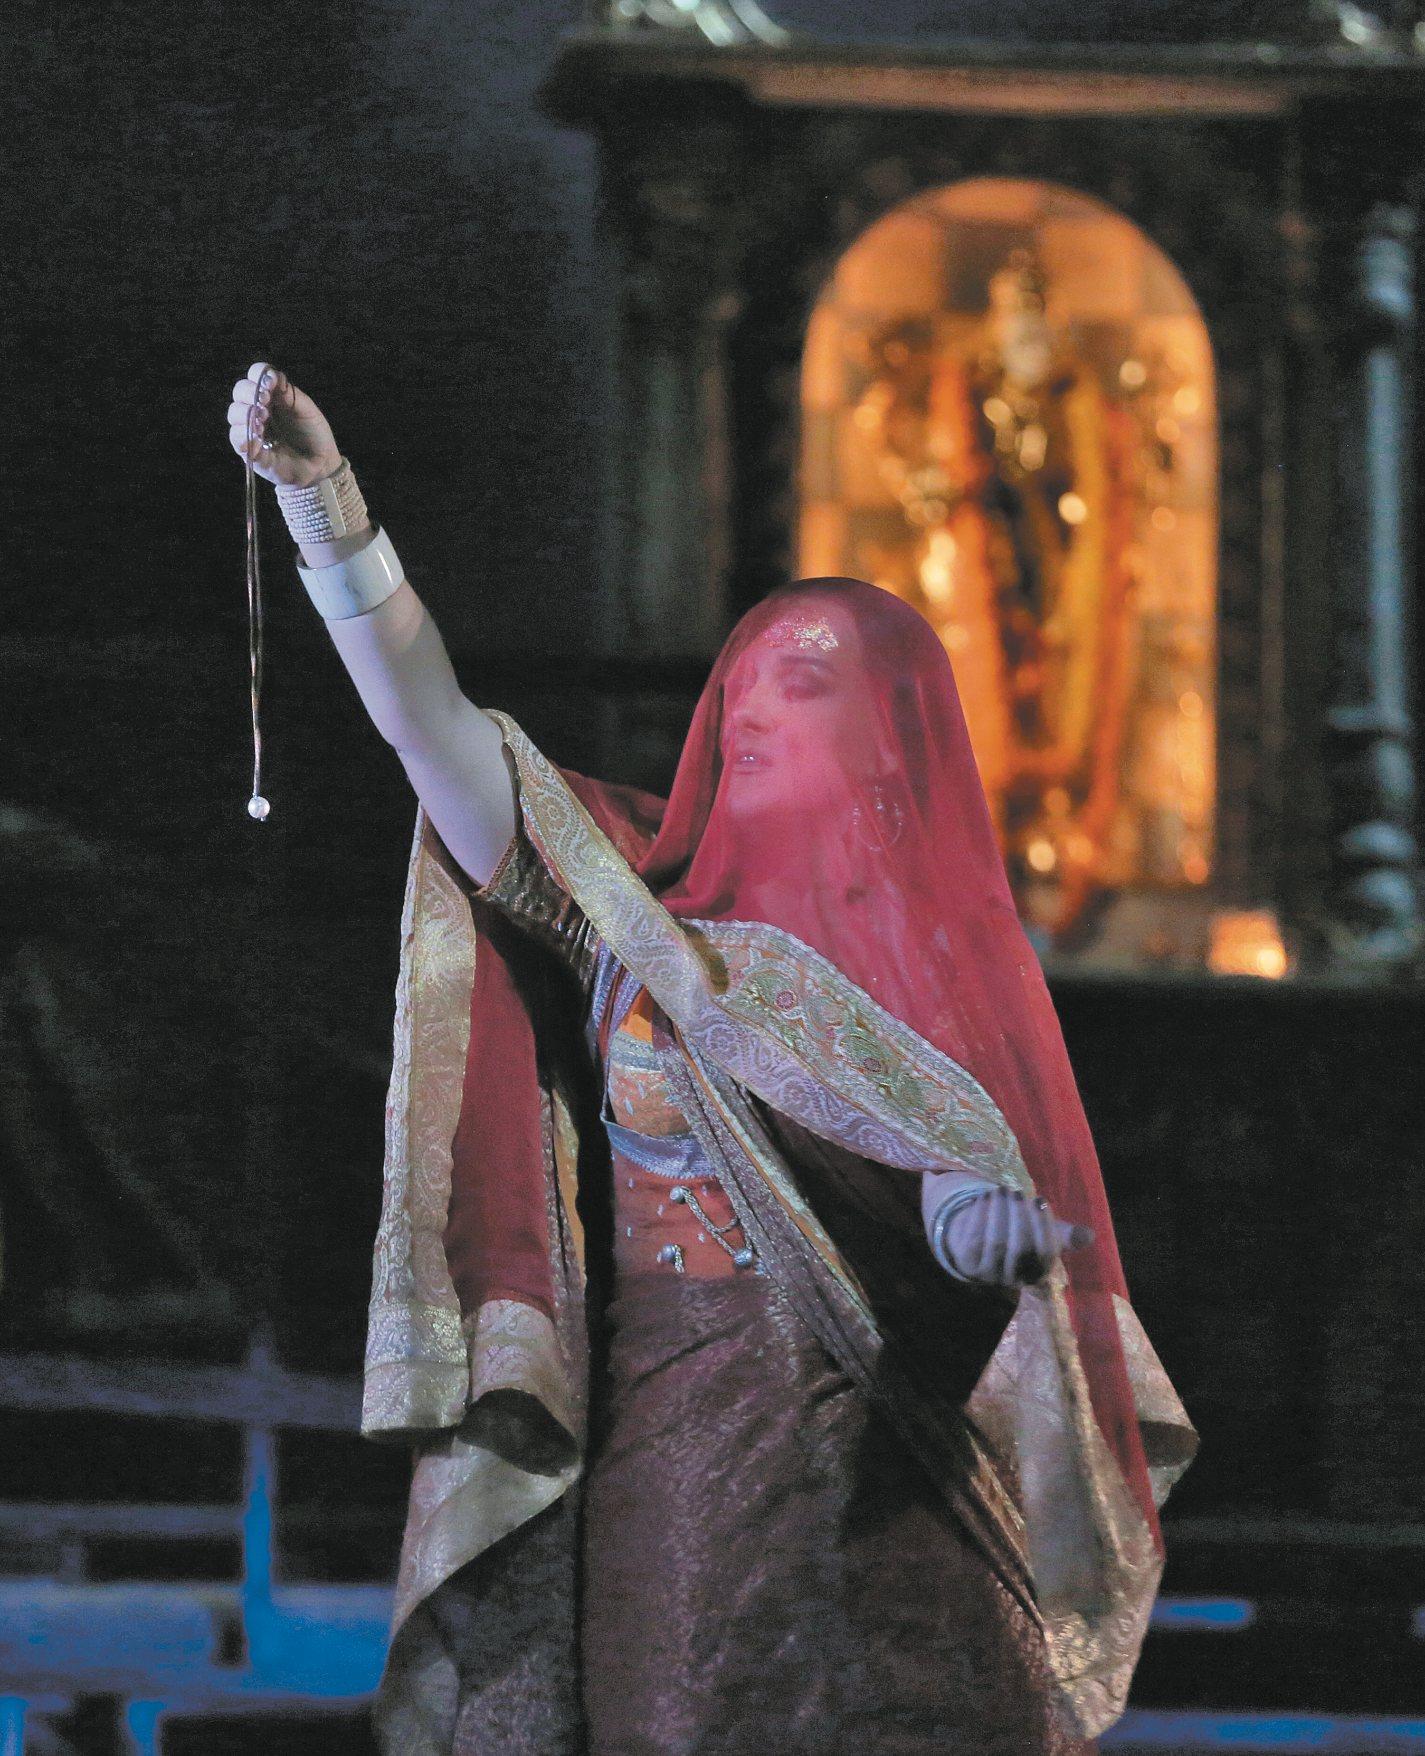 Diana Damrau as Leila in Georges Bizet's opera Les Pêcheurs de Perles